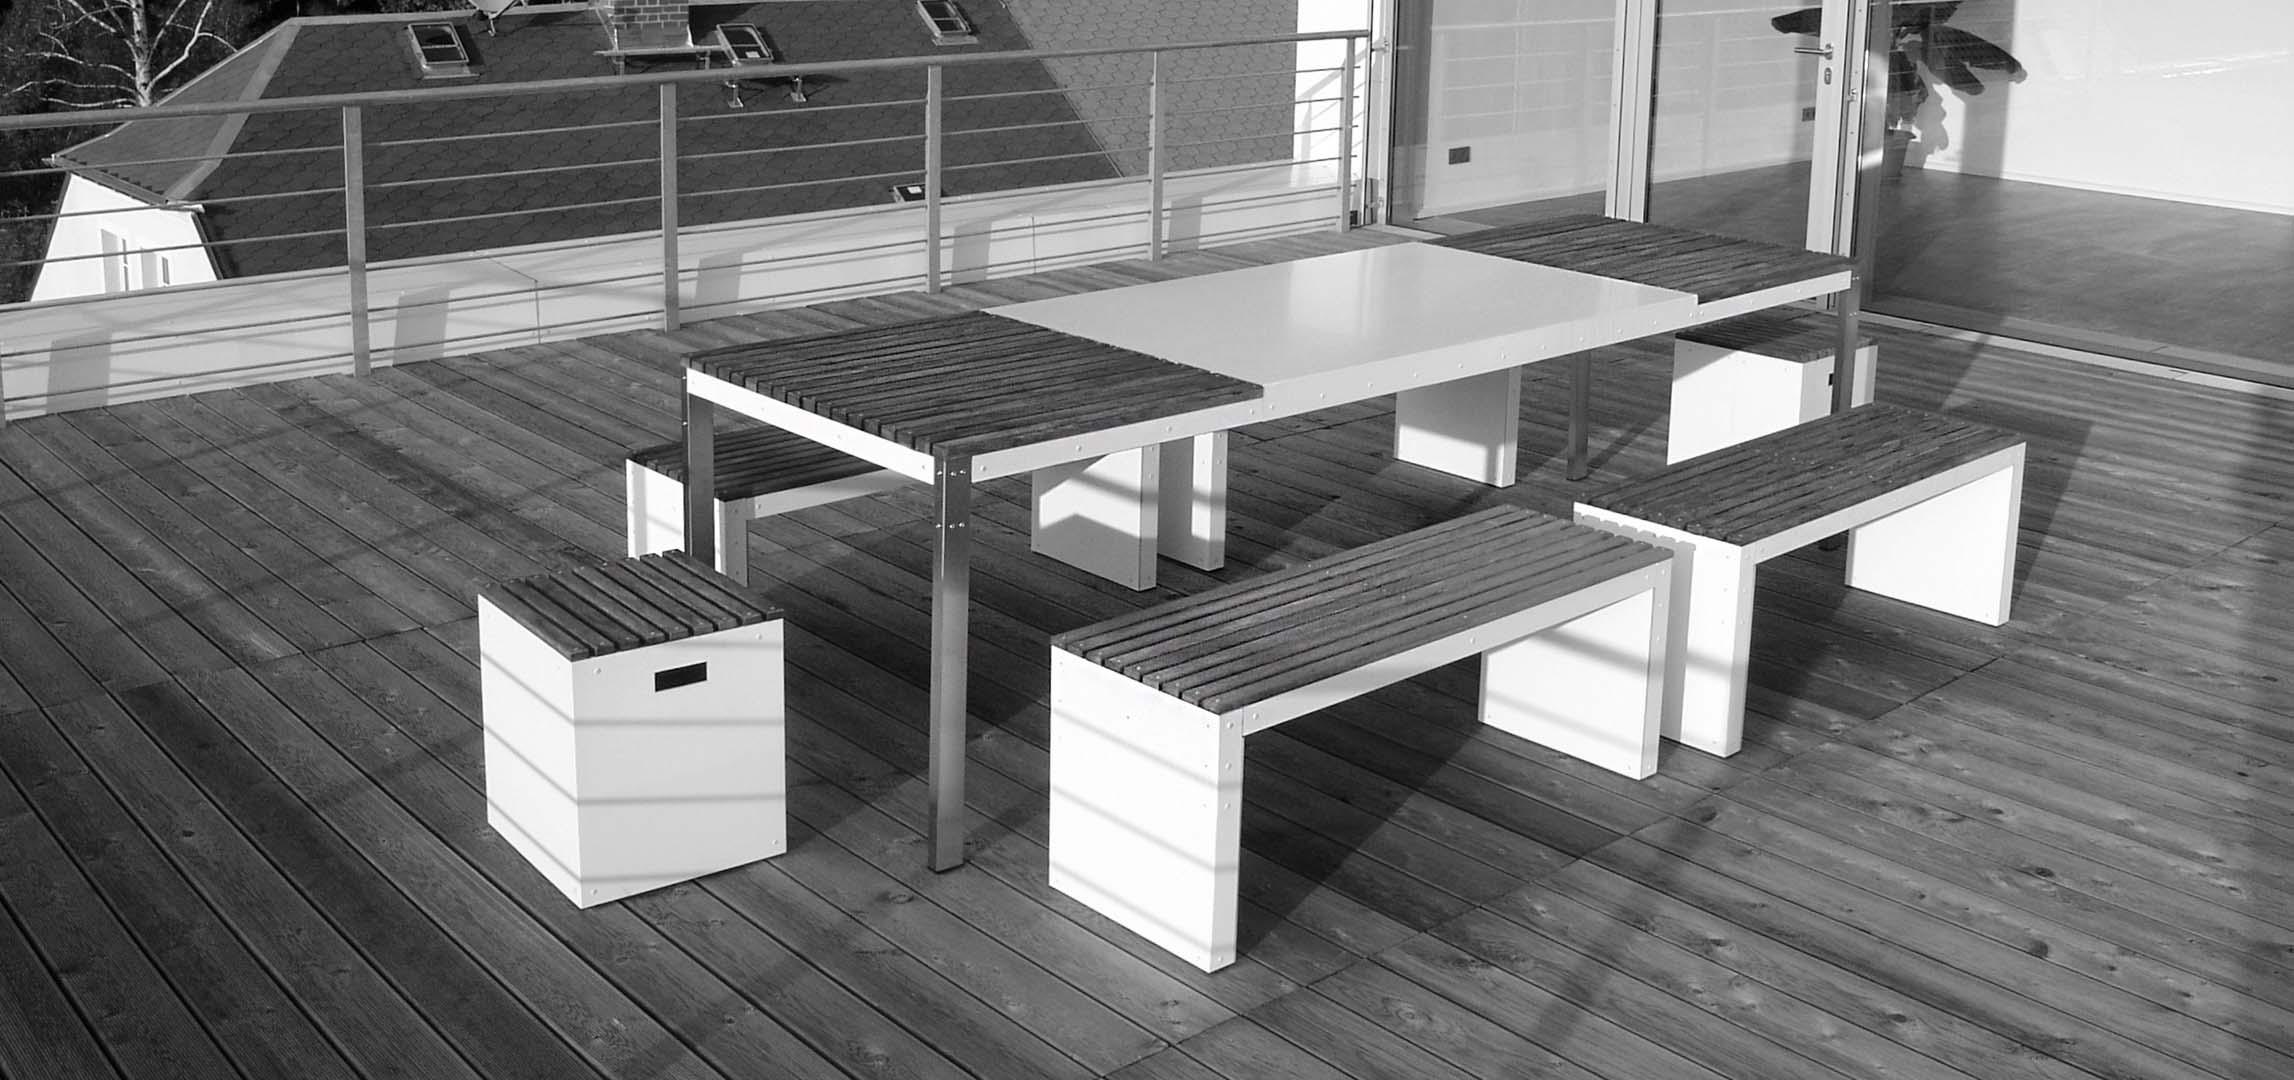 Design Tisch Sealine Nummer 2 aus Holz Metall Teak by Sebastian Bohry timeless design